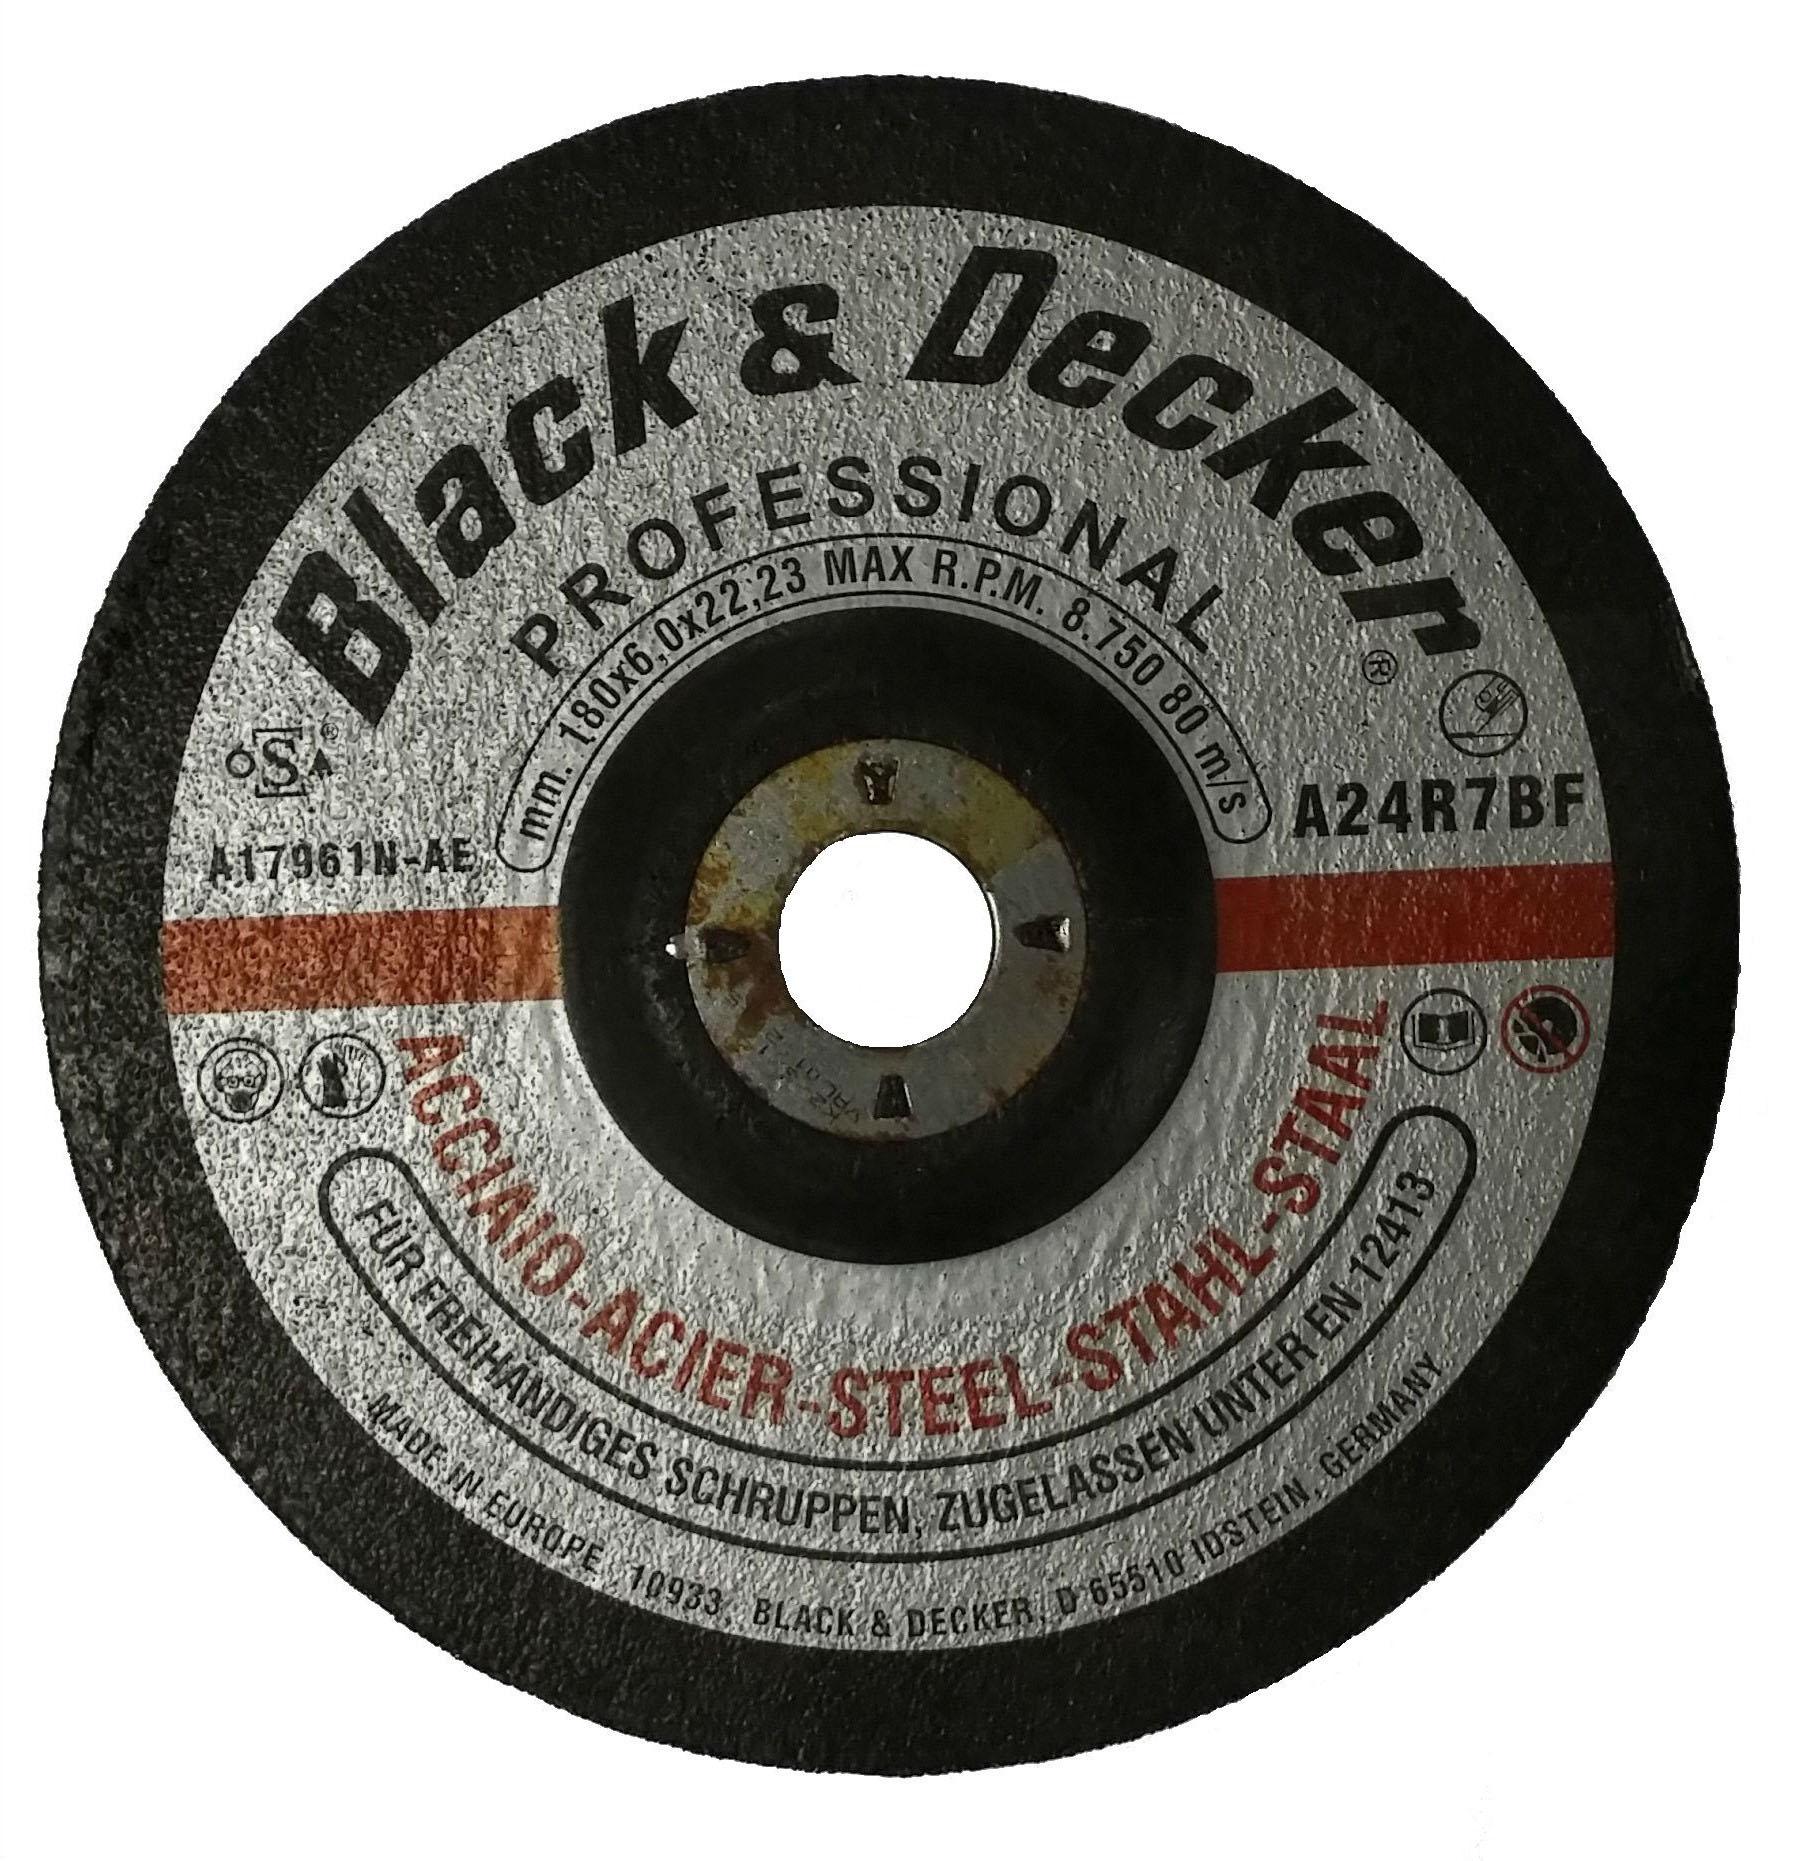 Black & Decker A17961N-AE - 7-inch Metal Grinding Disc